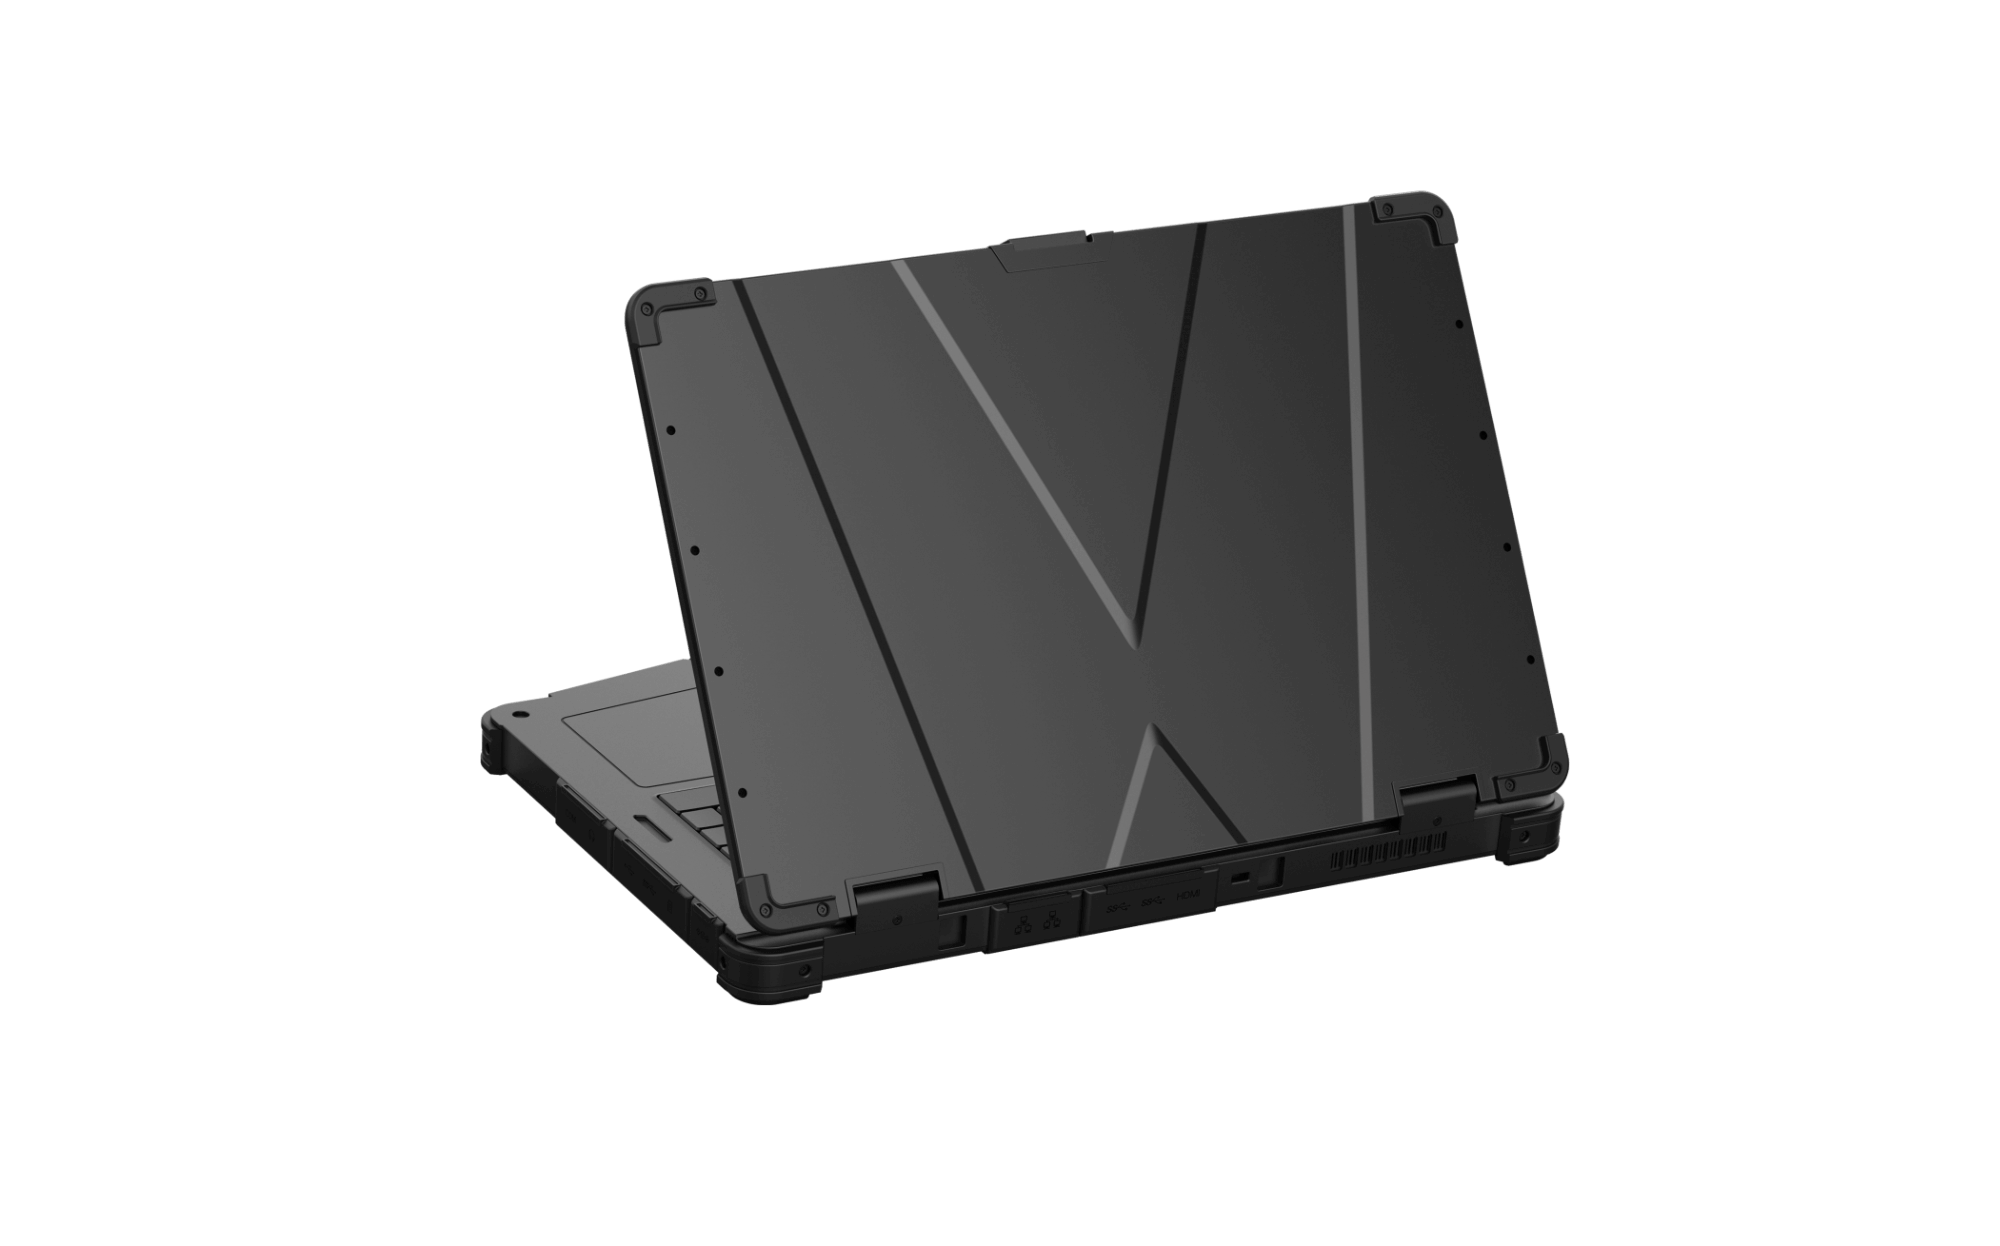 Rockbook X550 Rugged Notebook from back